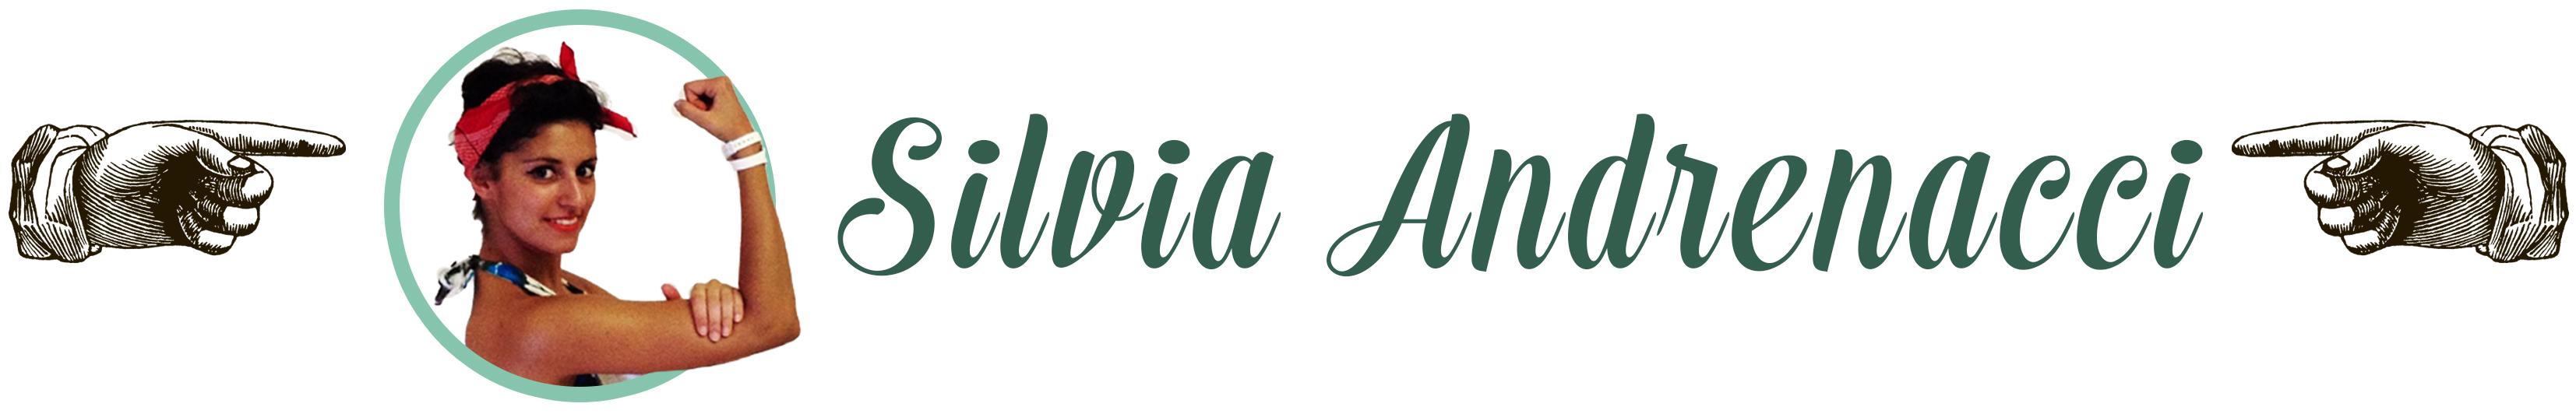 1-SILVIA-header